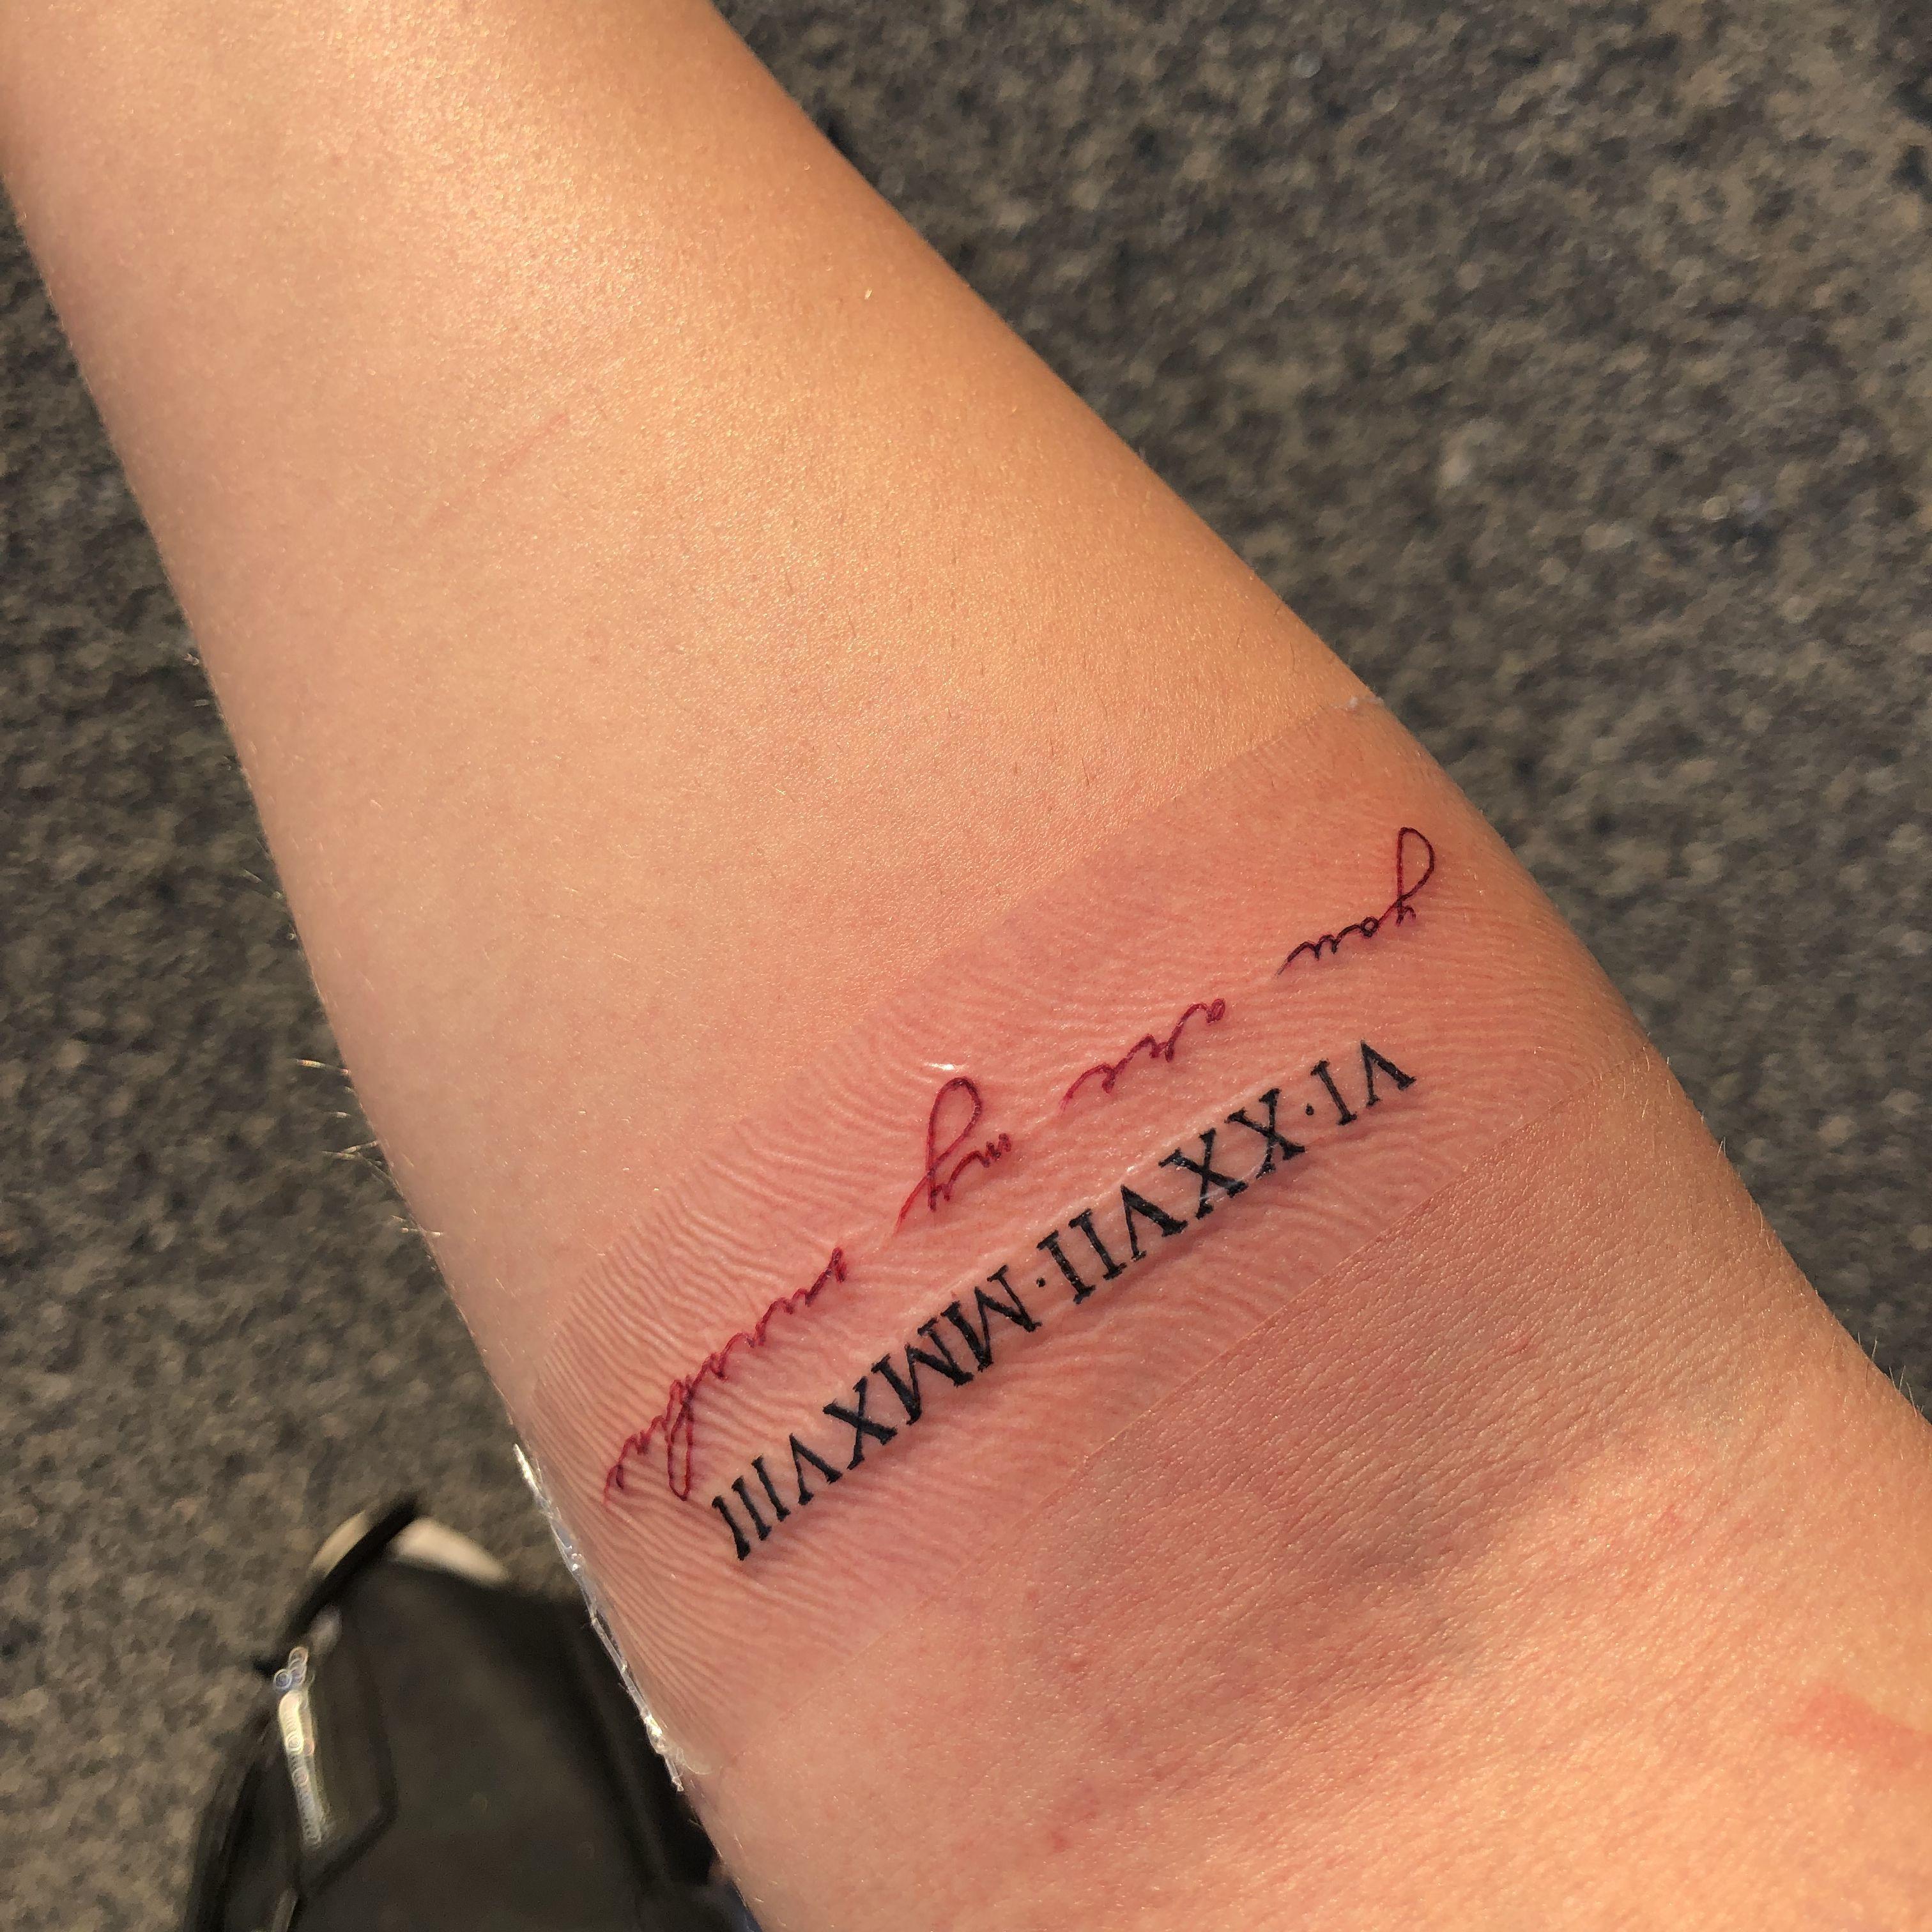 Kleine Rote Tatowierung Tattoo Ideas Red Tattoos Red Ink Tattoos Dainty Tattoos